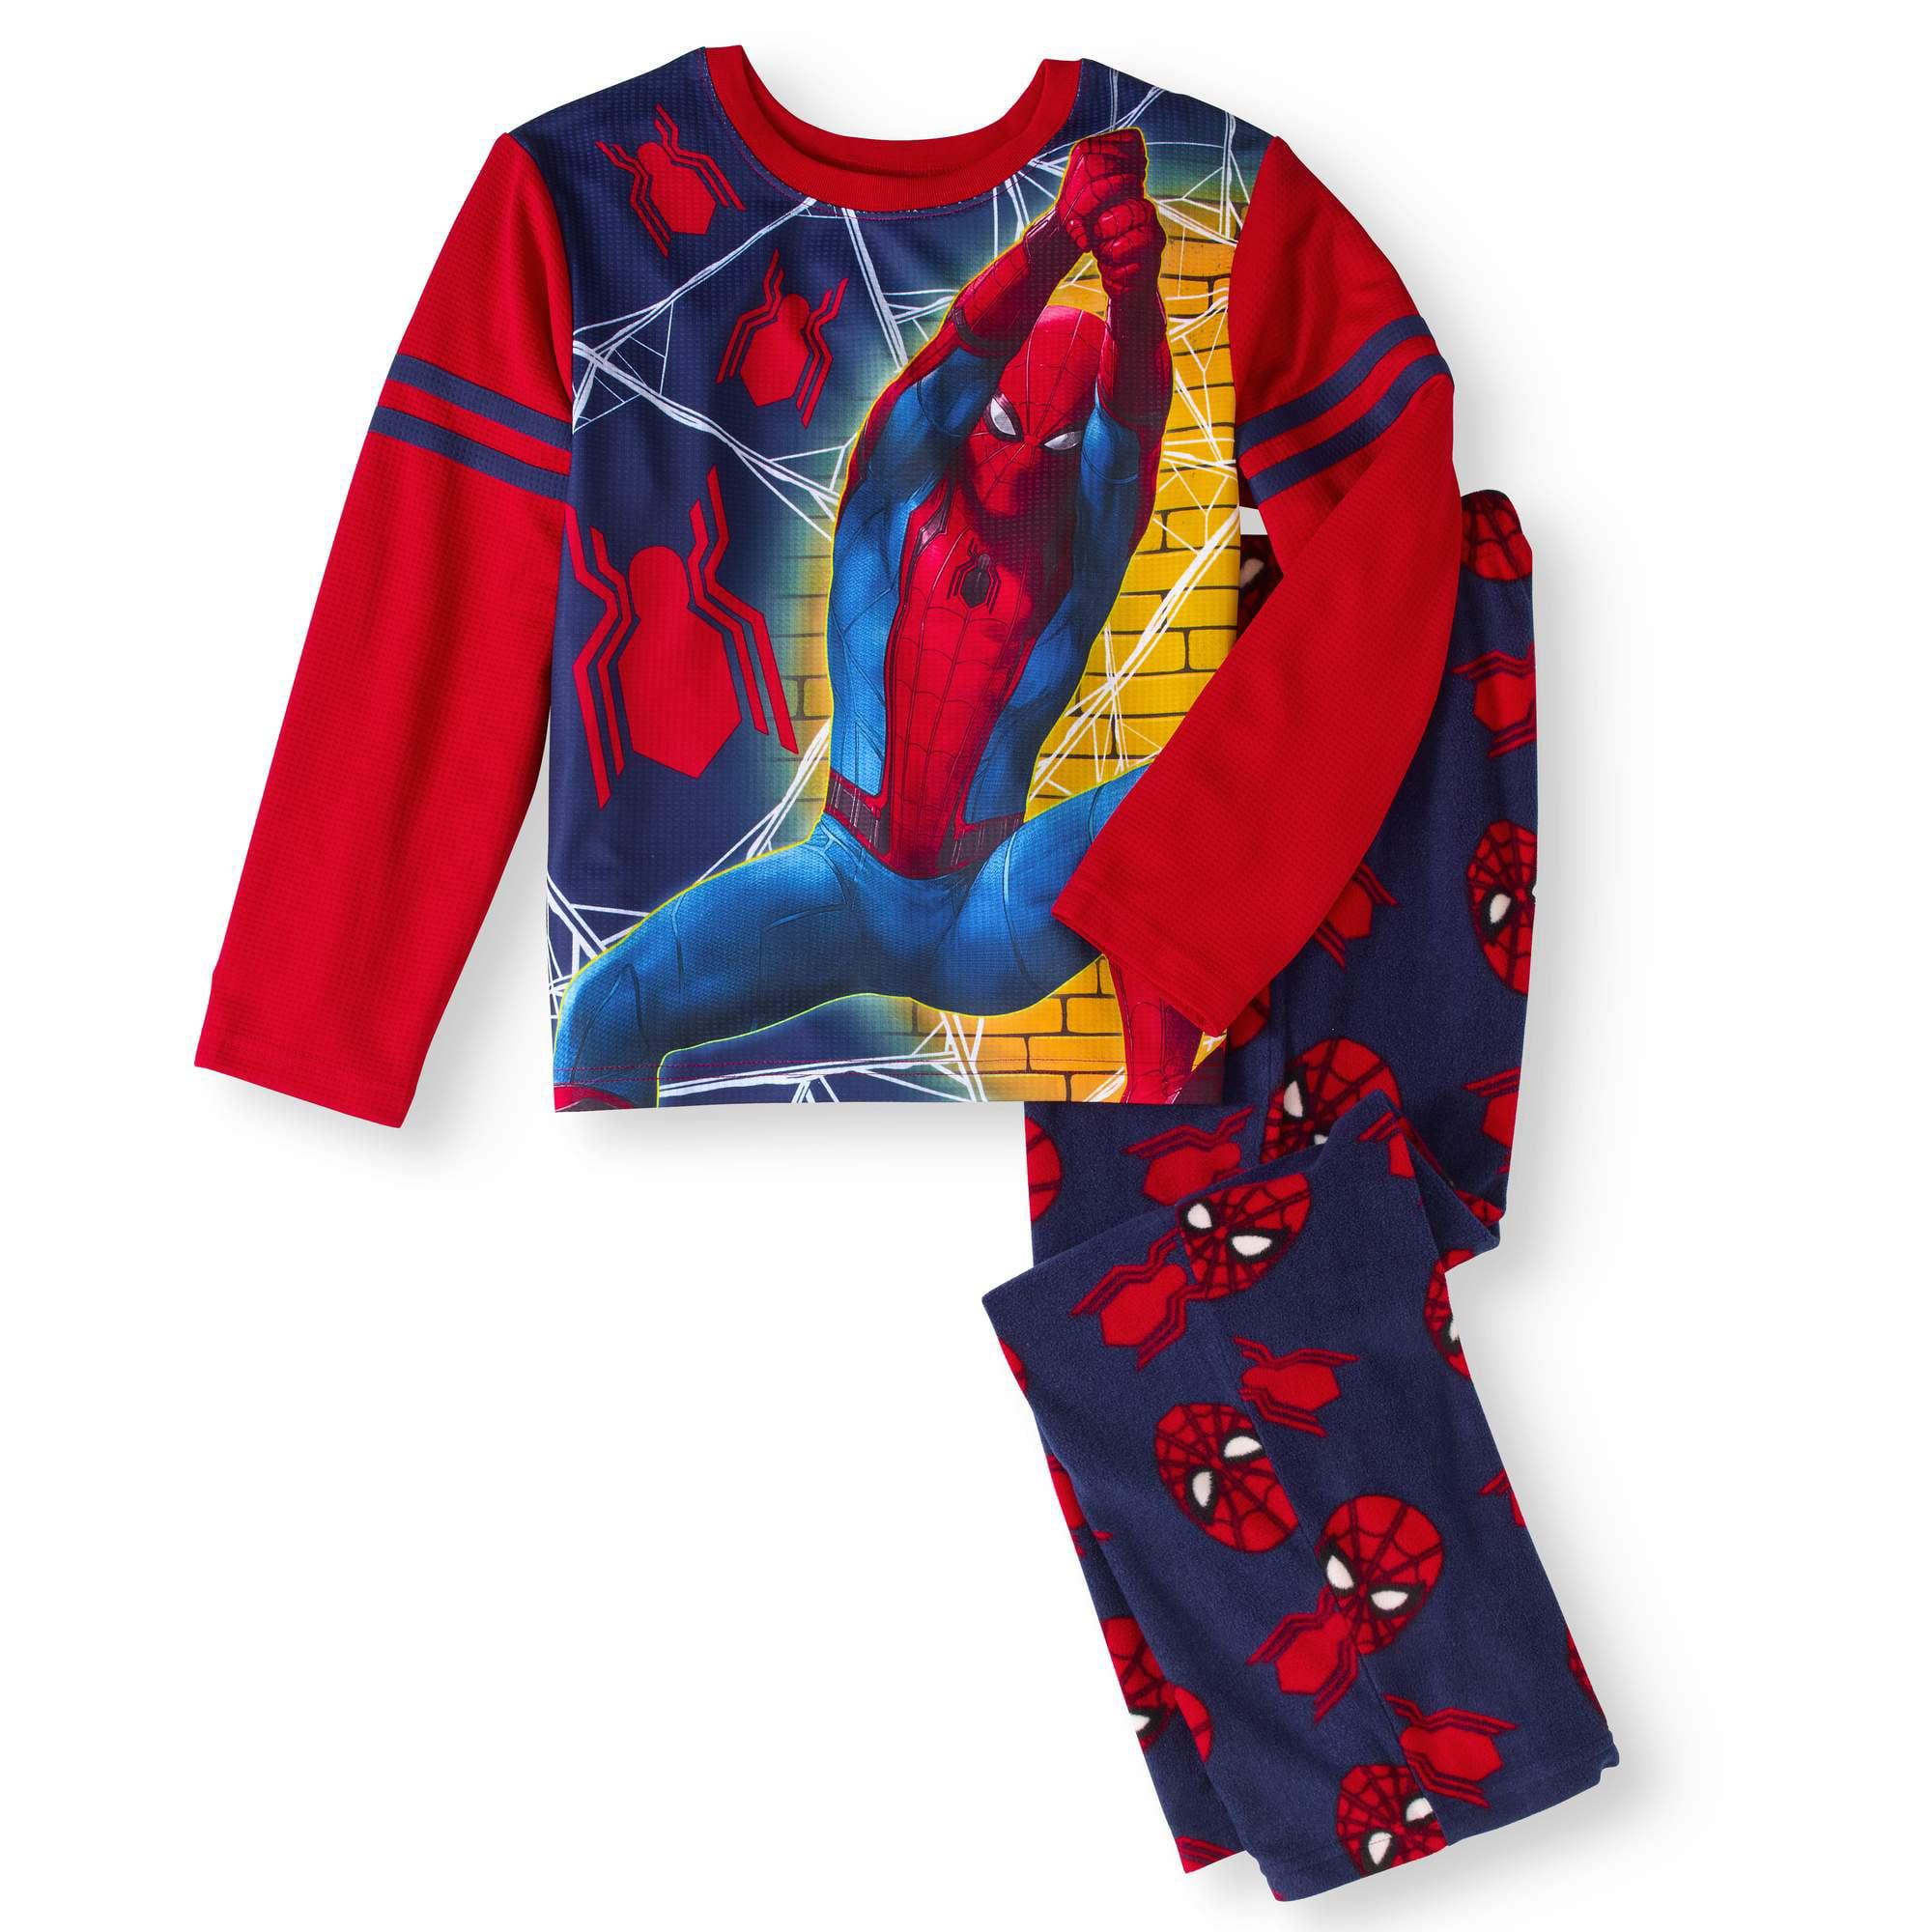 Spider-Man Boys' Microfleece 2 Piece Pajama Sleepwear Set (Big Boys & Little Boys)